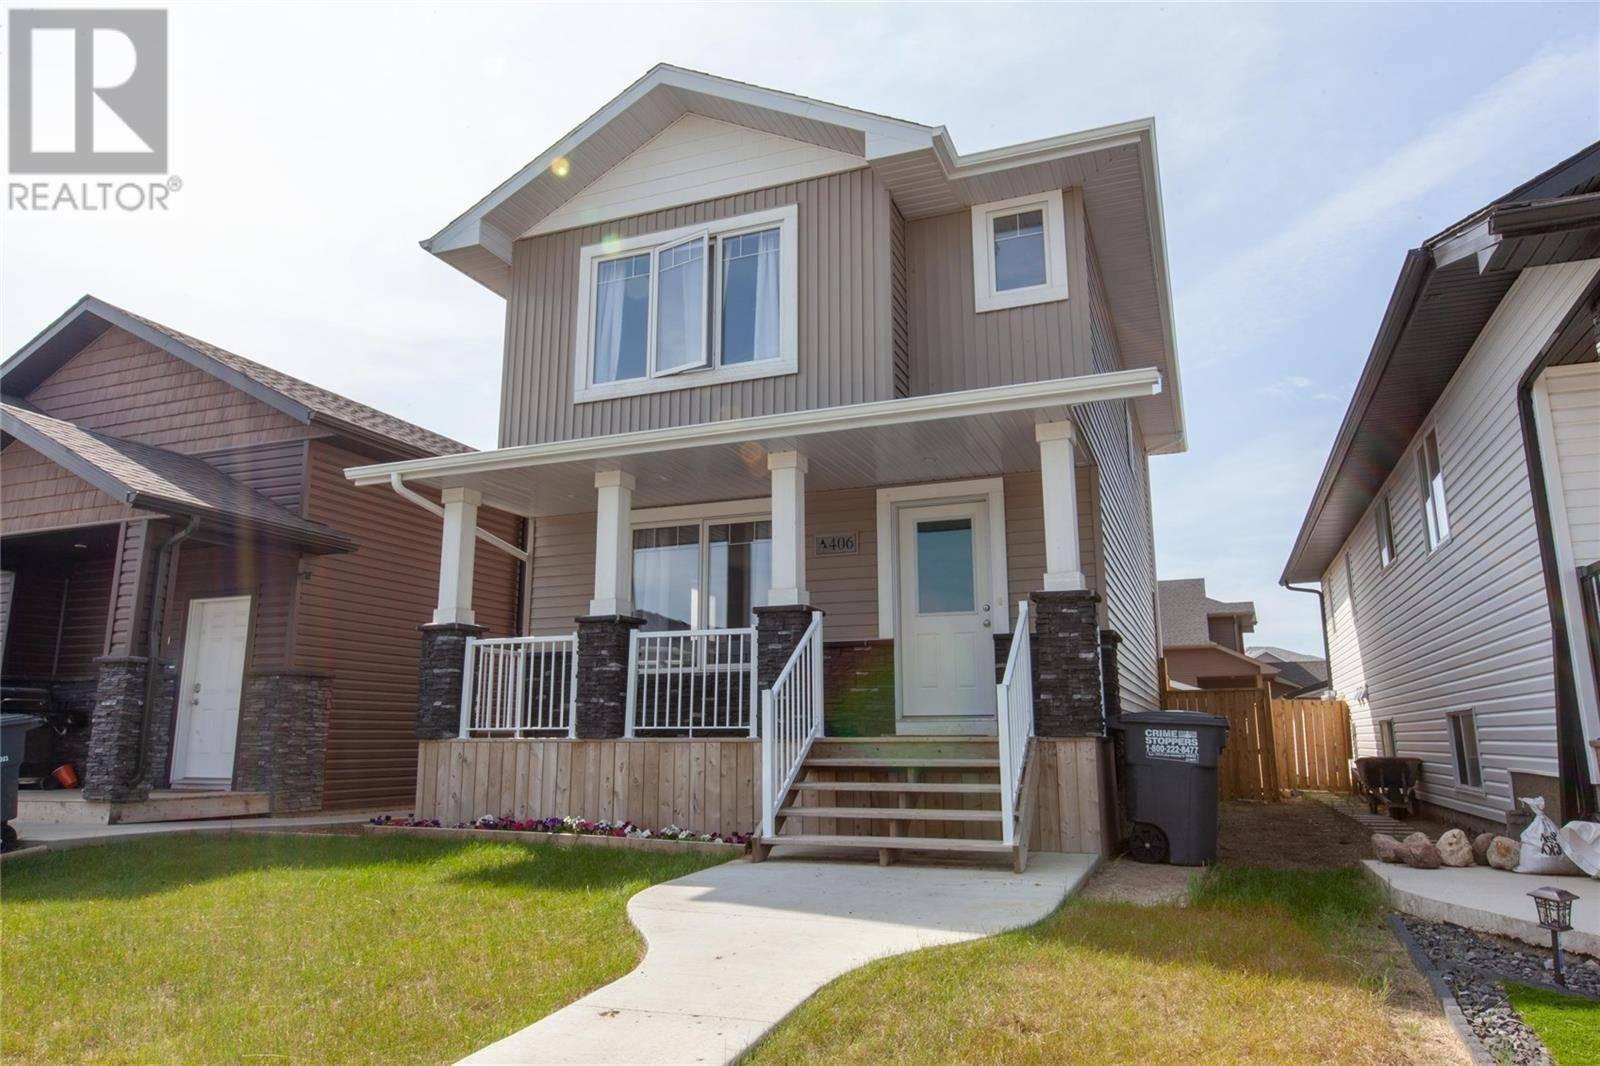 House for sale at 406 Boykowich St Saskatoon Saskatchewan - MLS: SK778263